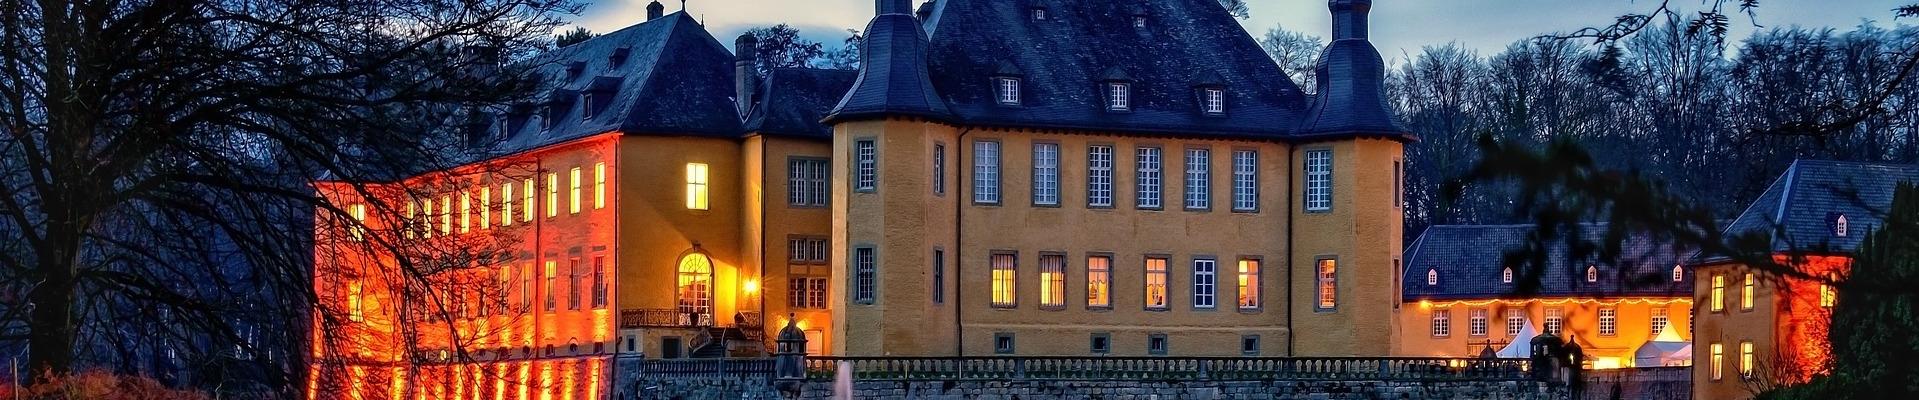 gemeinschaftlich Leben im Schloss